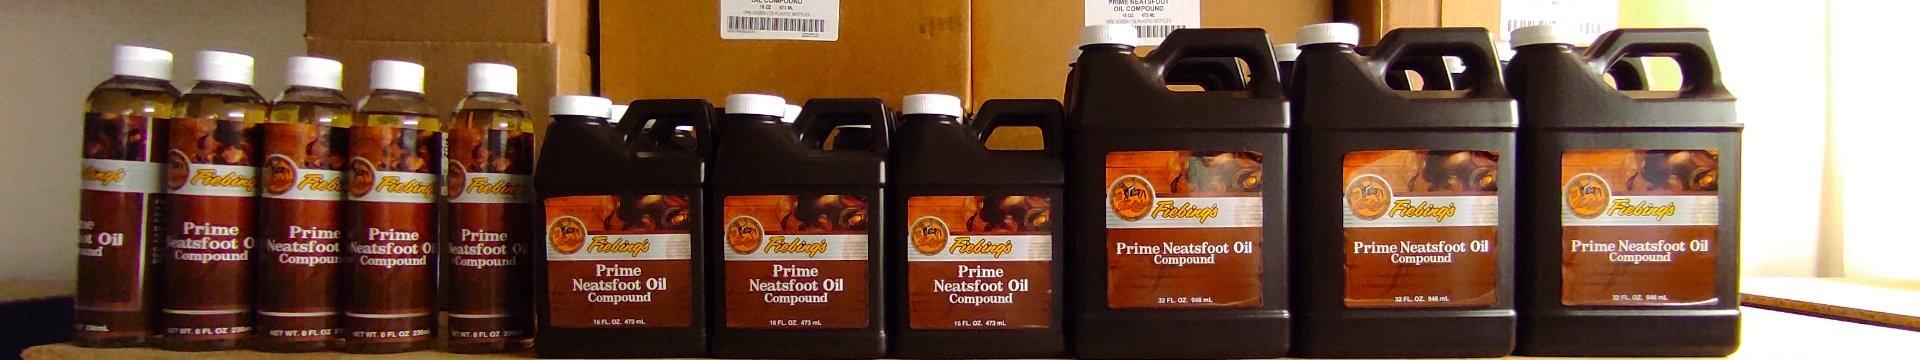 Prime Neatsfoot Oil